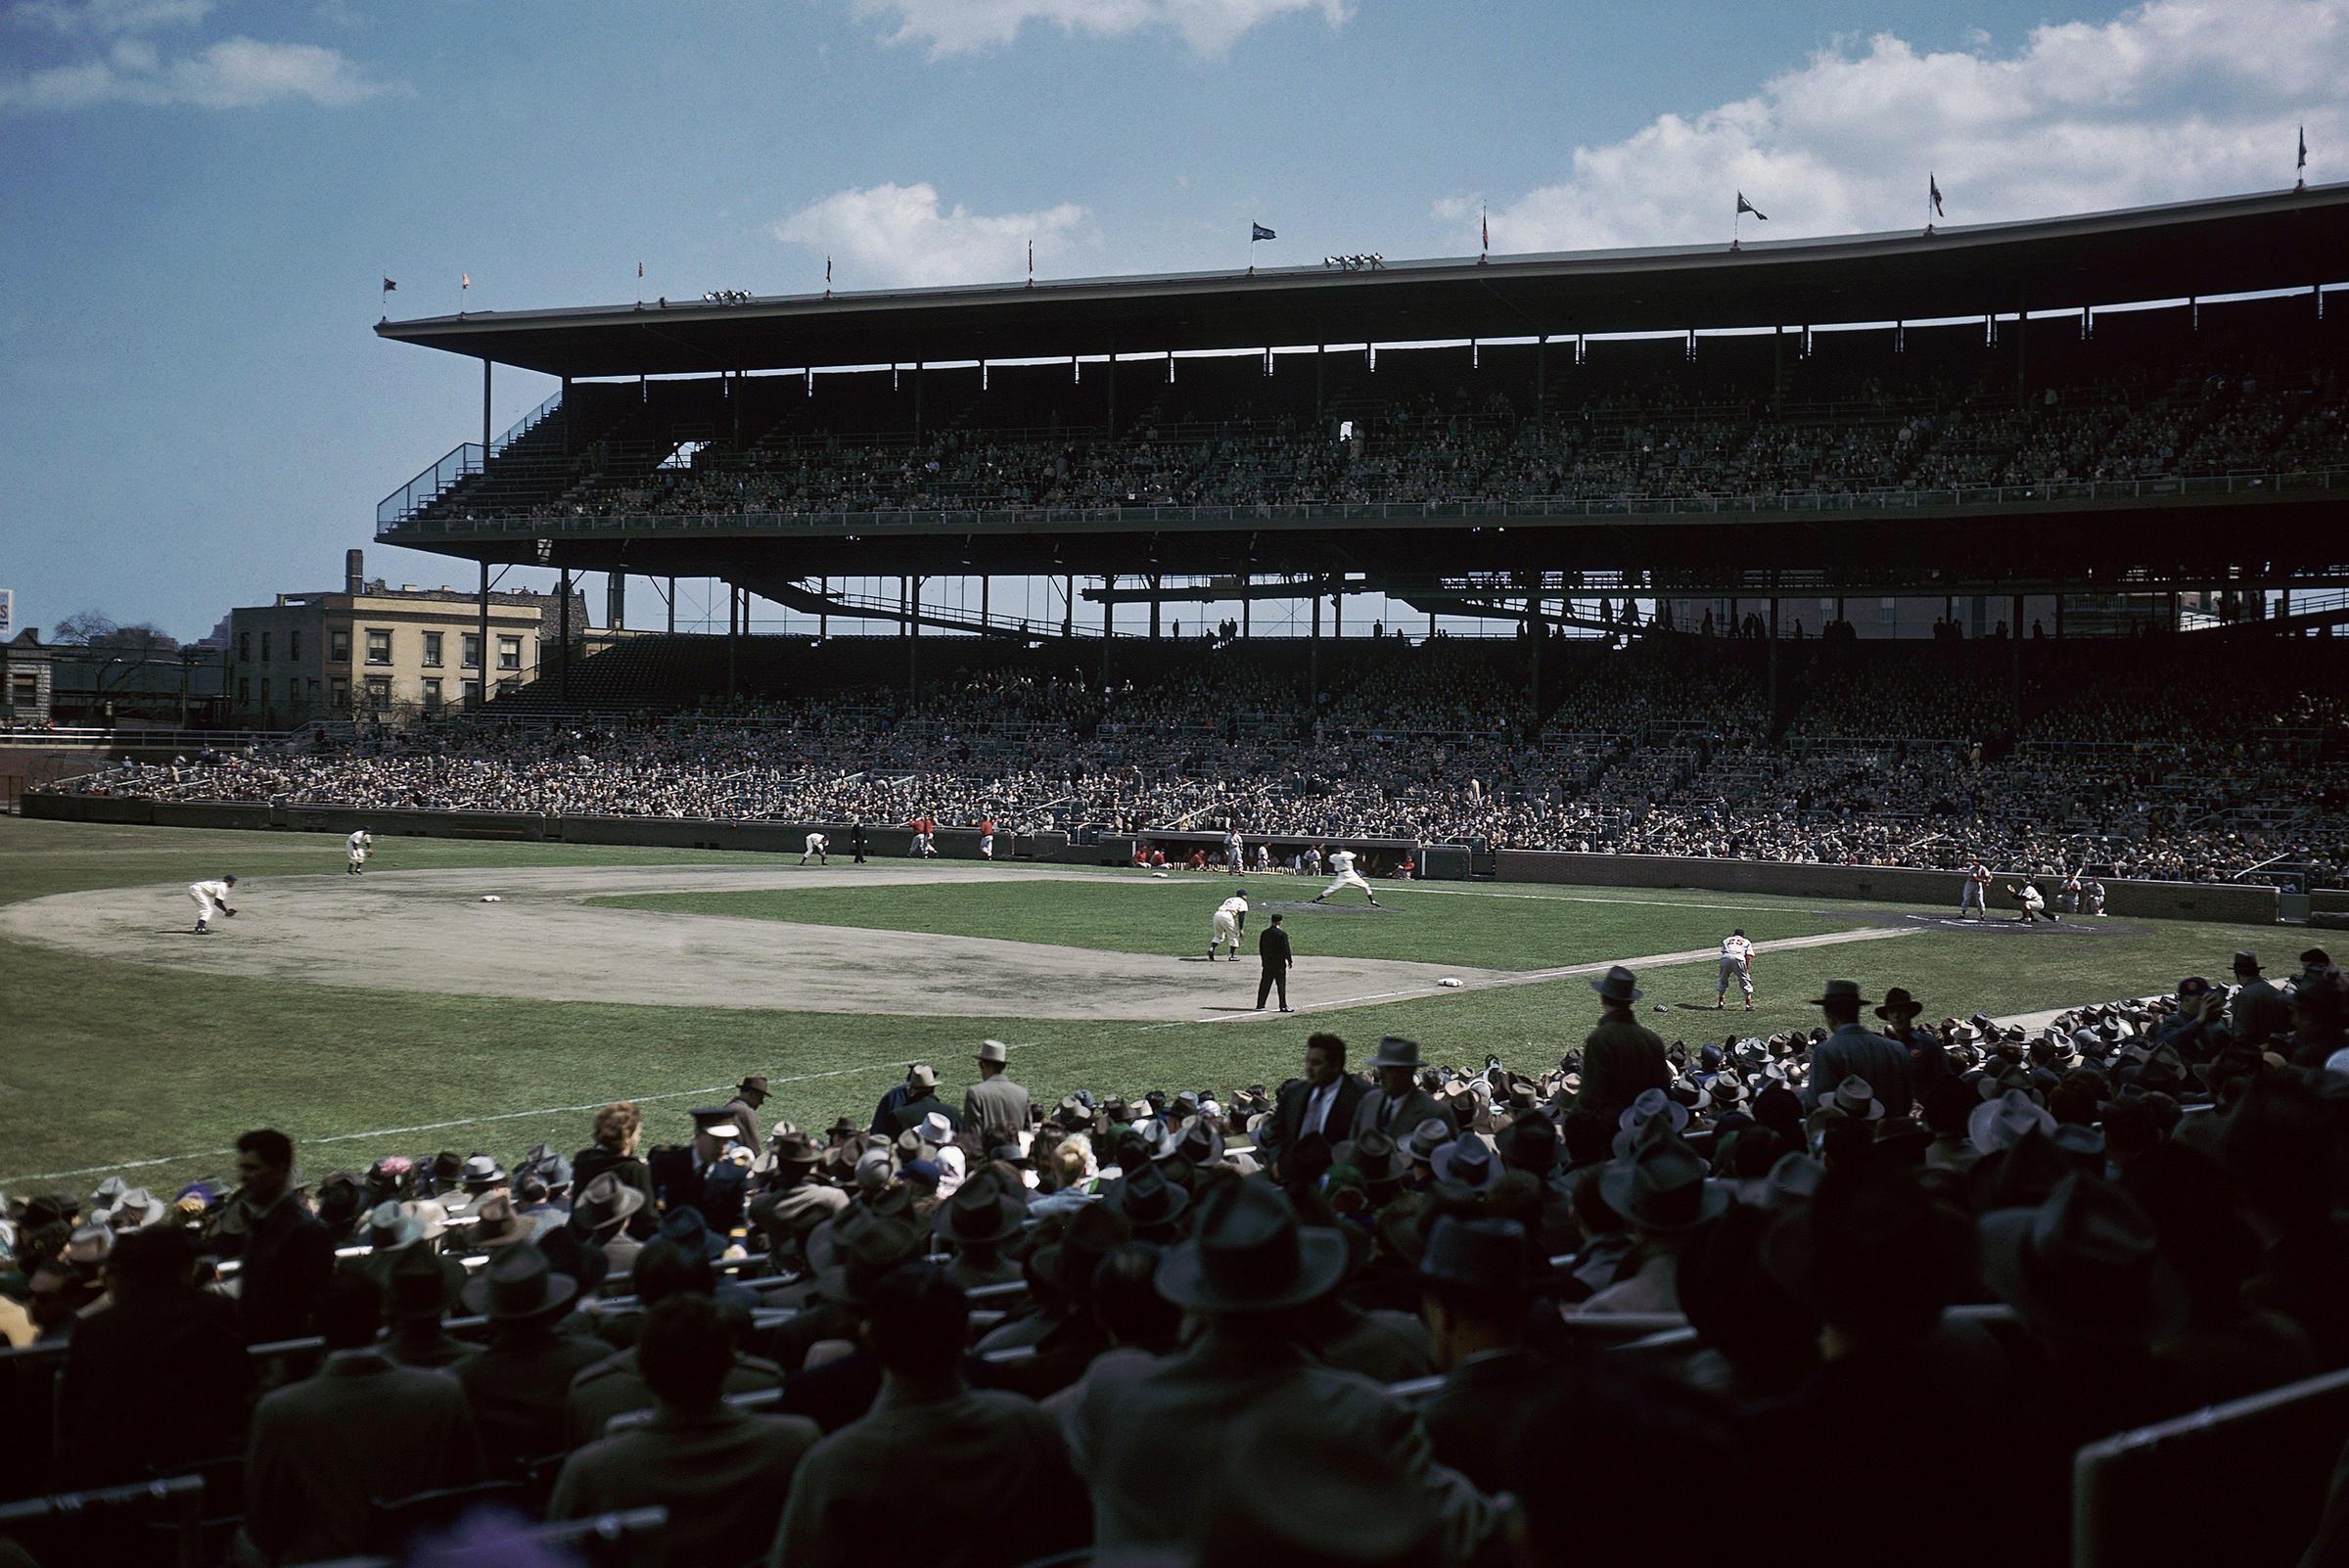 Chicago Celebrates A Century Baseball At Wrigley Field